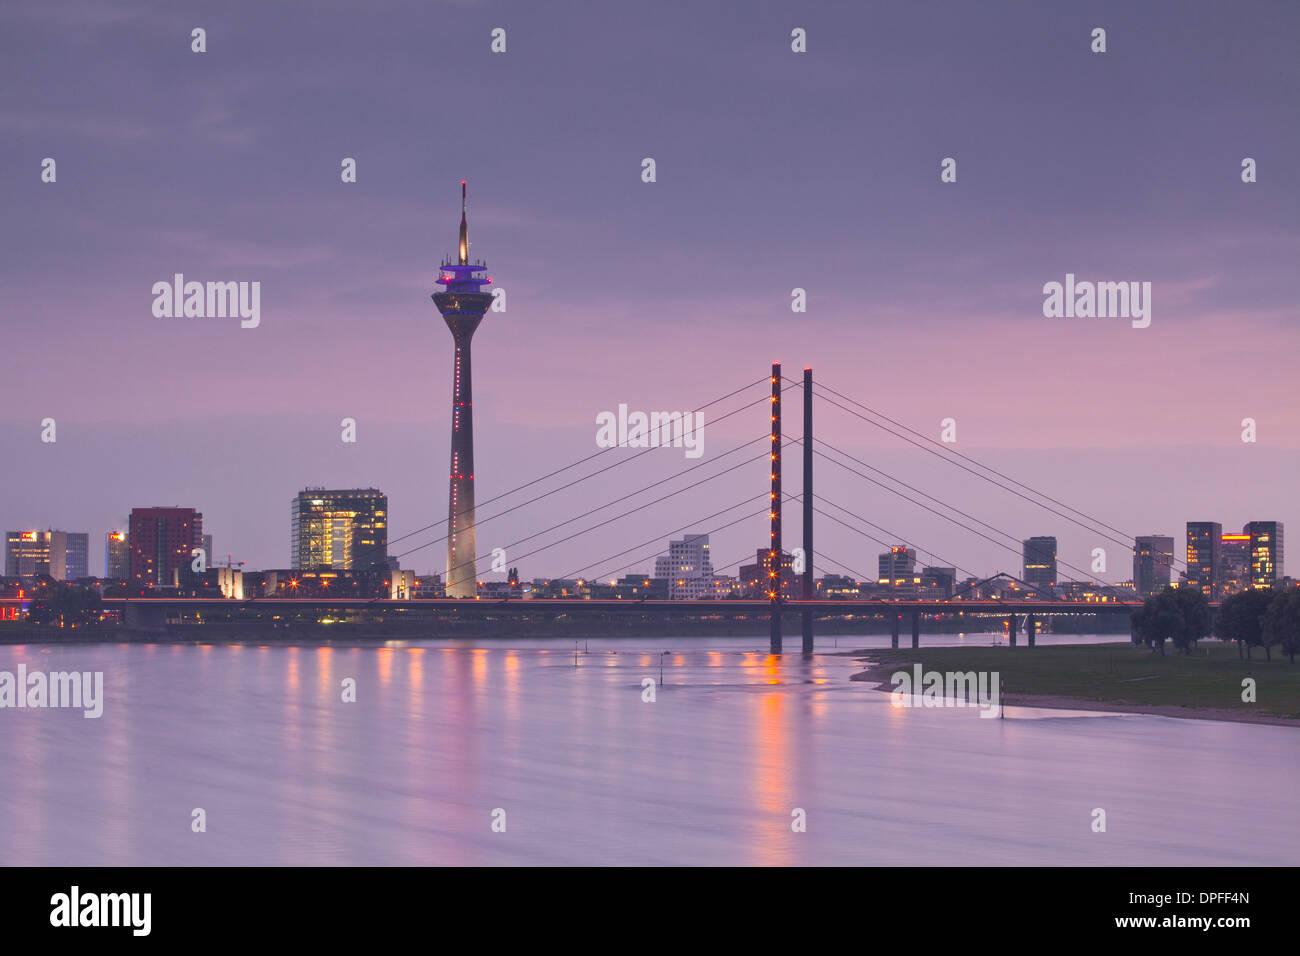 The Dusseldorf skyline at dusk, Dusseldorf, North Rhine-Westphalia, Germany, Europe Stock Photo